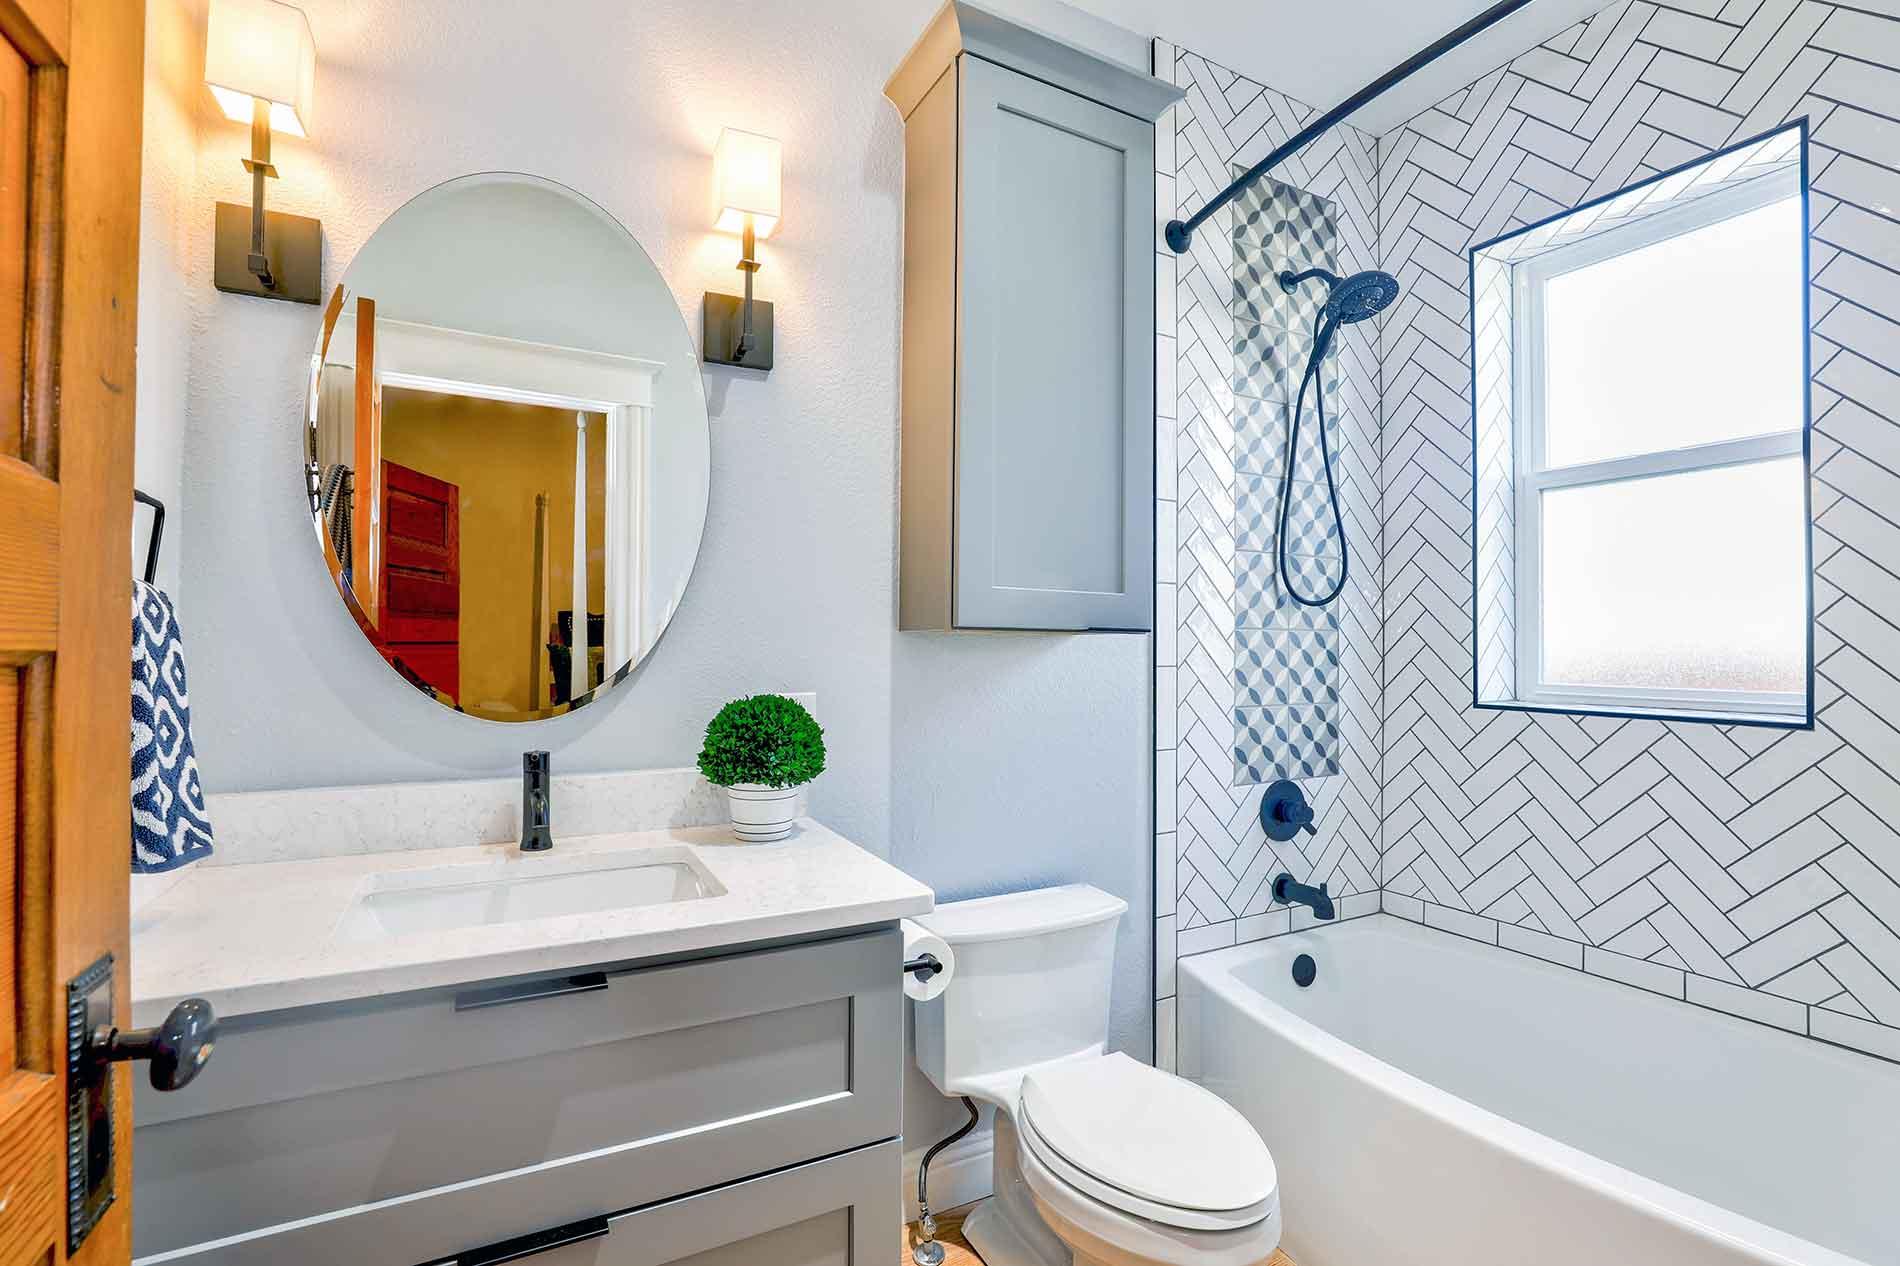 blue-themed bathroom with herringbone tile